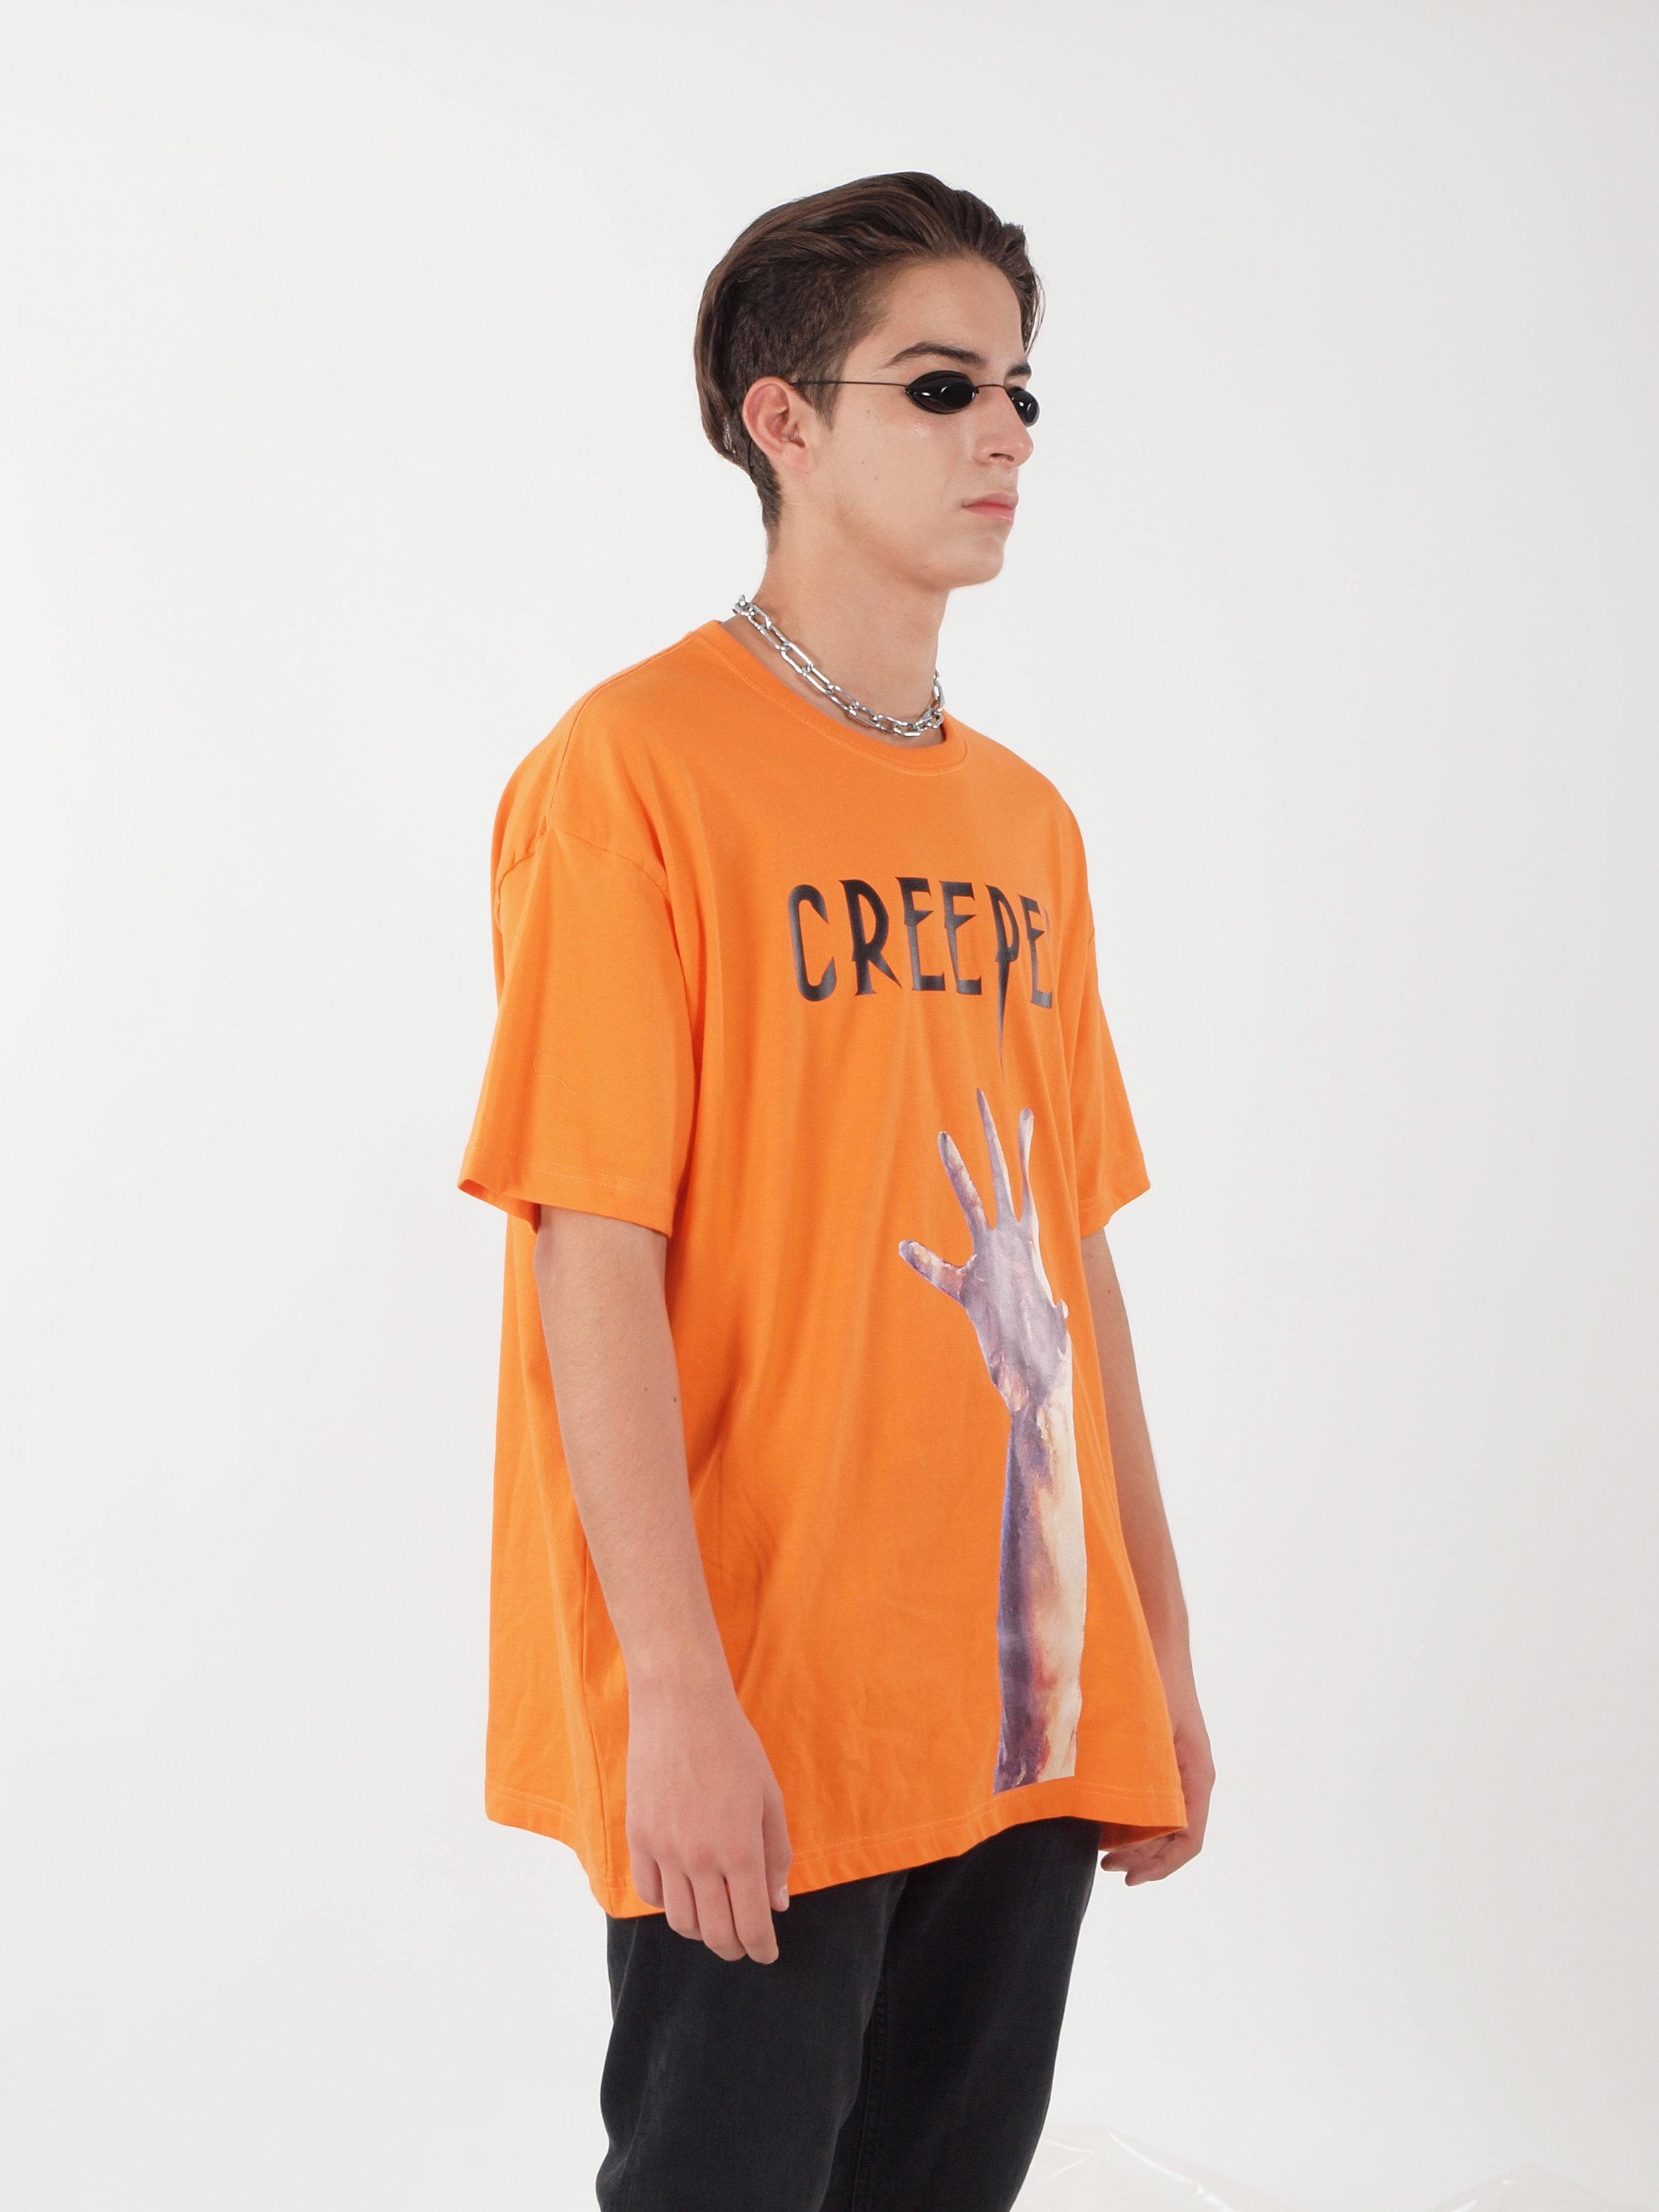 orange t side.jpg